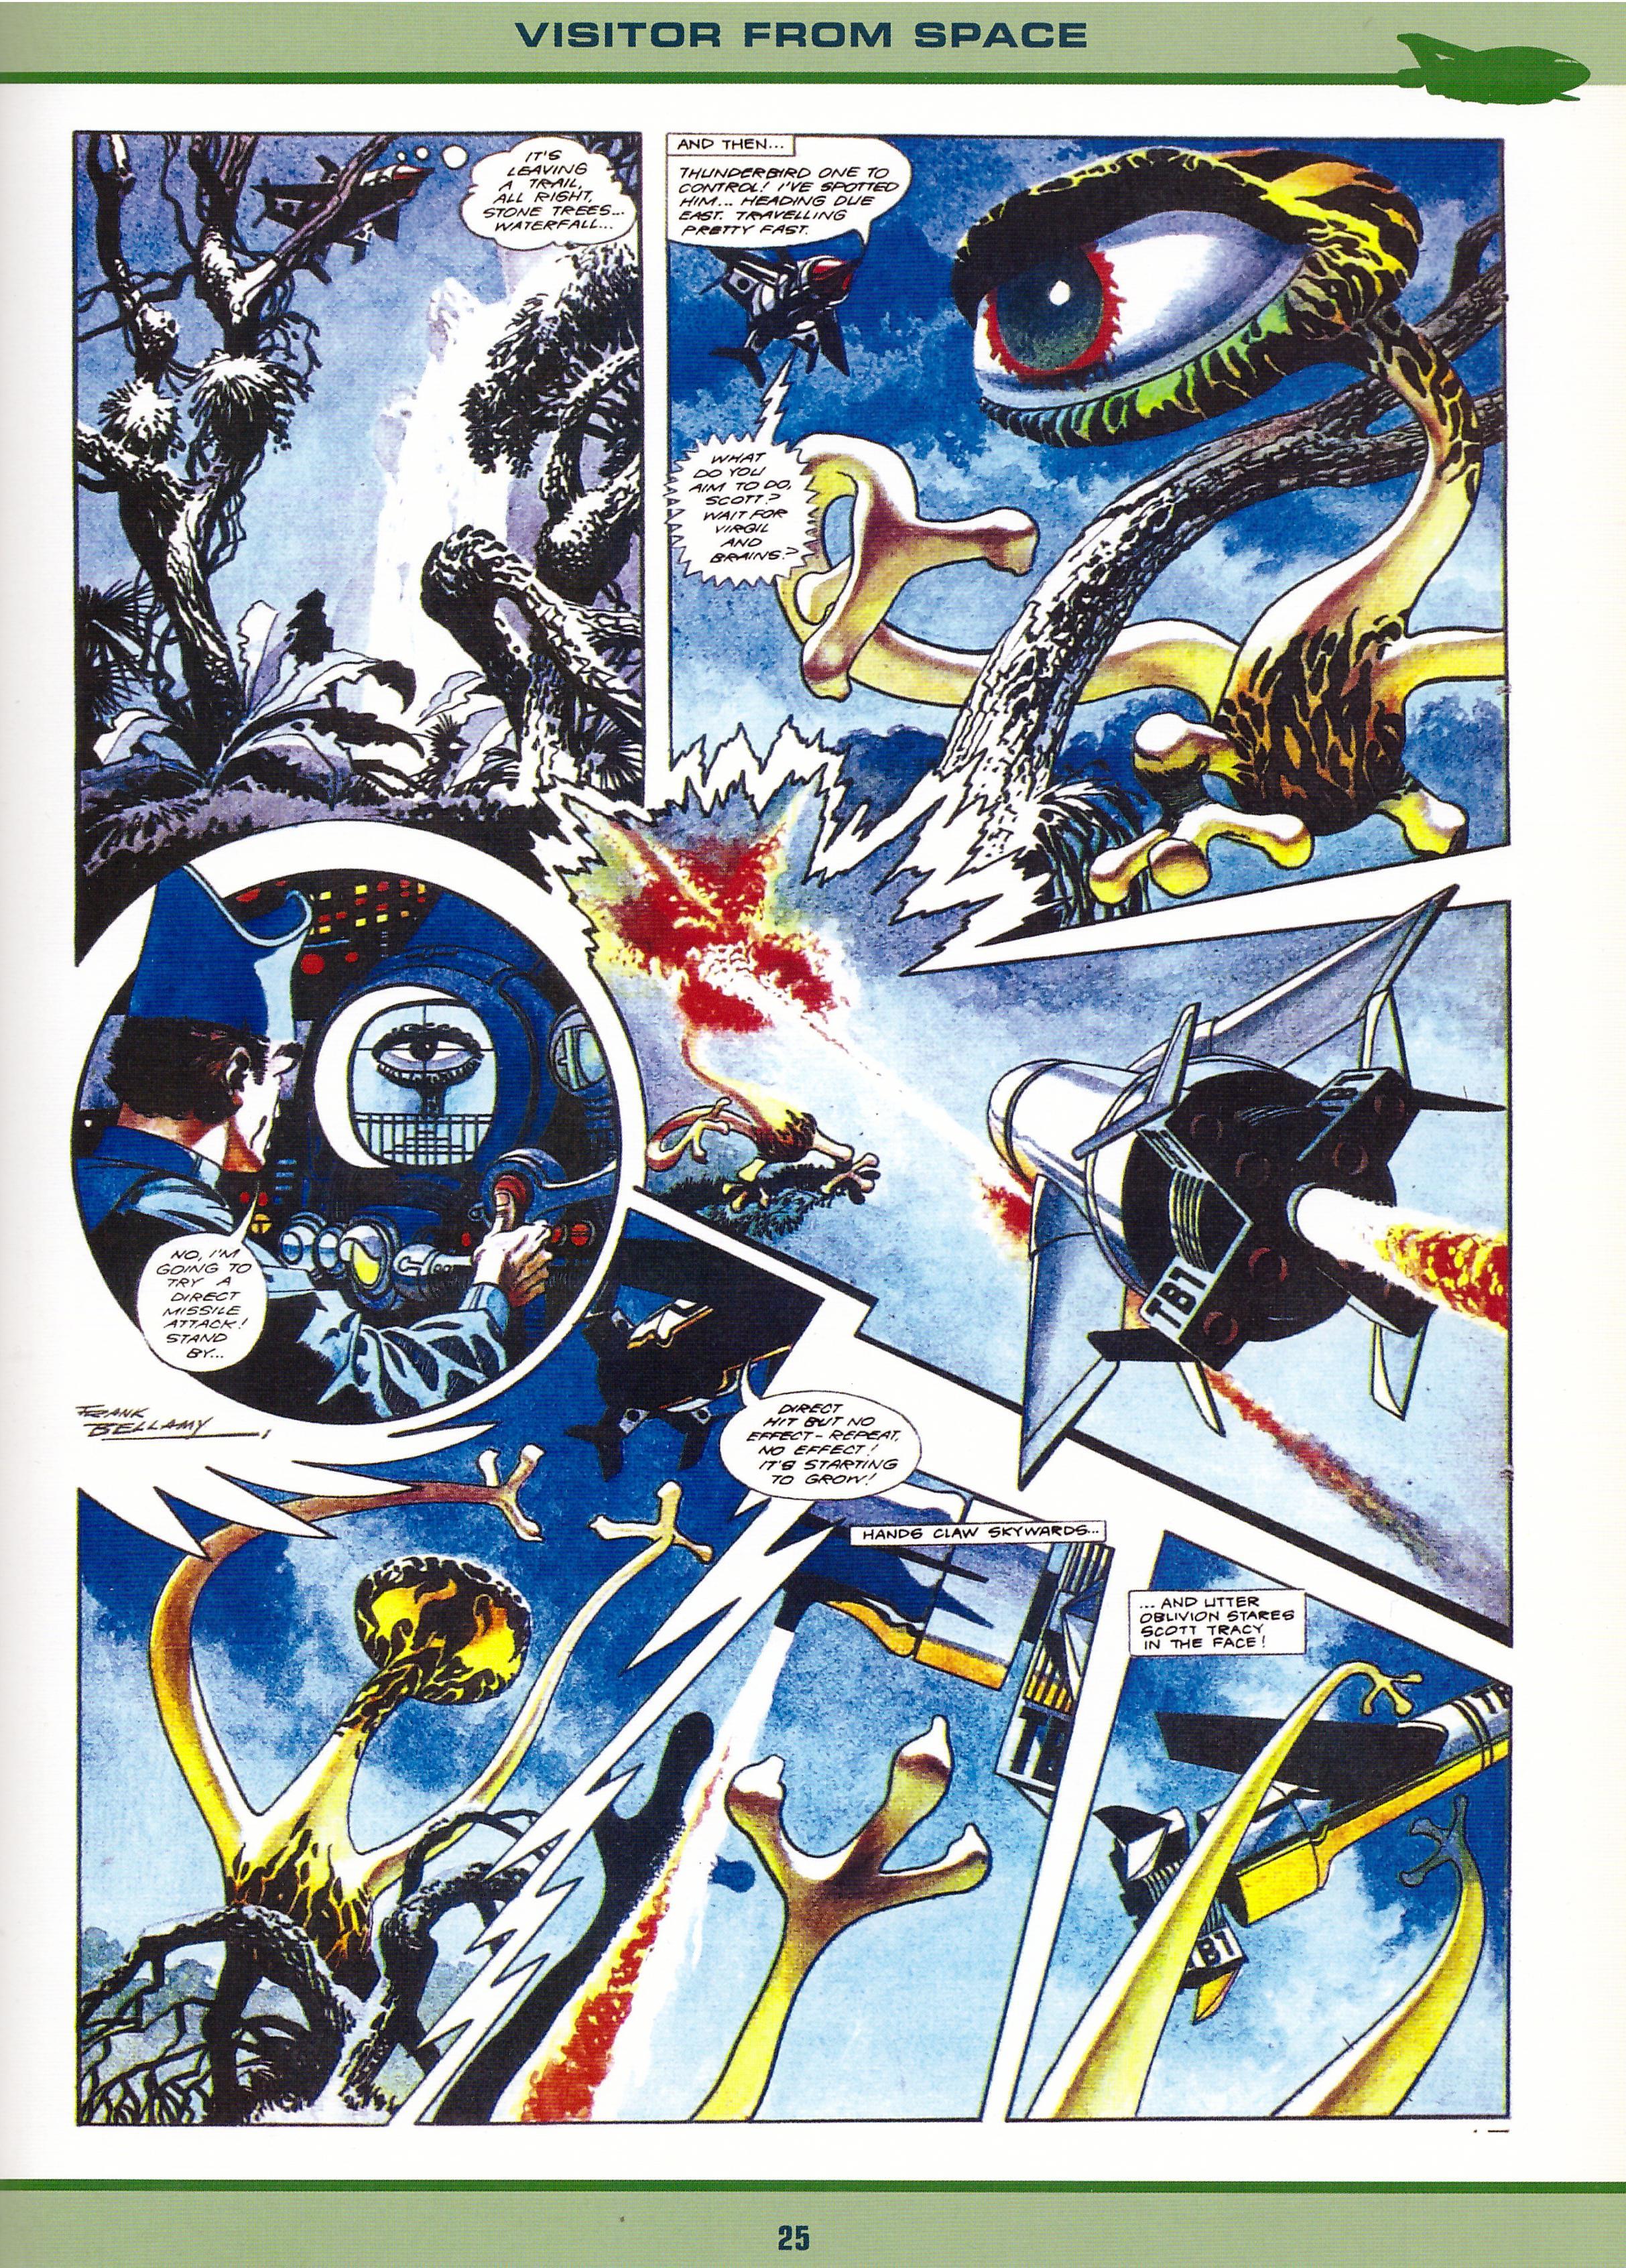 Thunderbirds Vol 1 graphic novel review